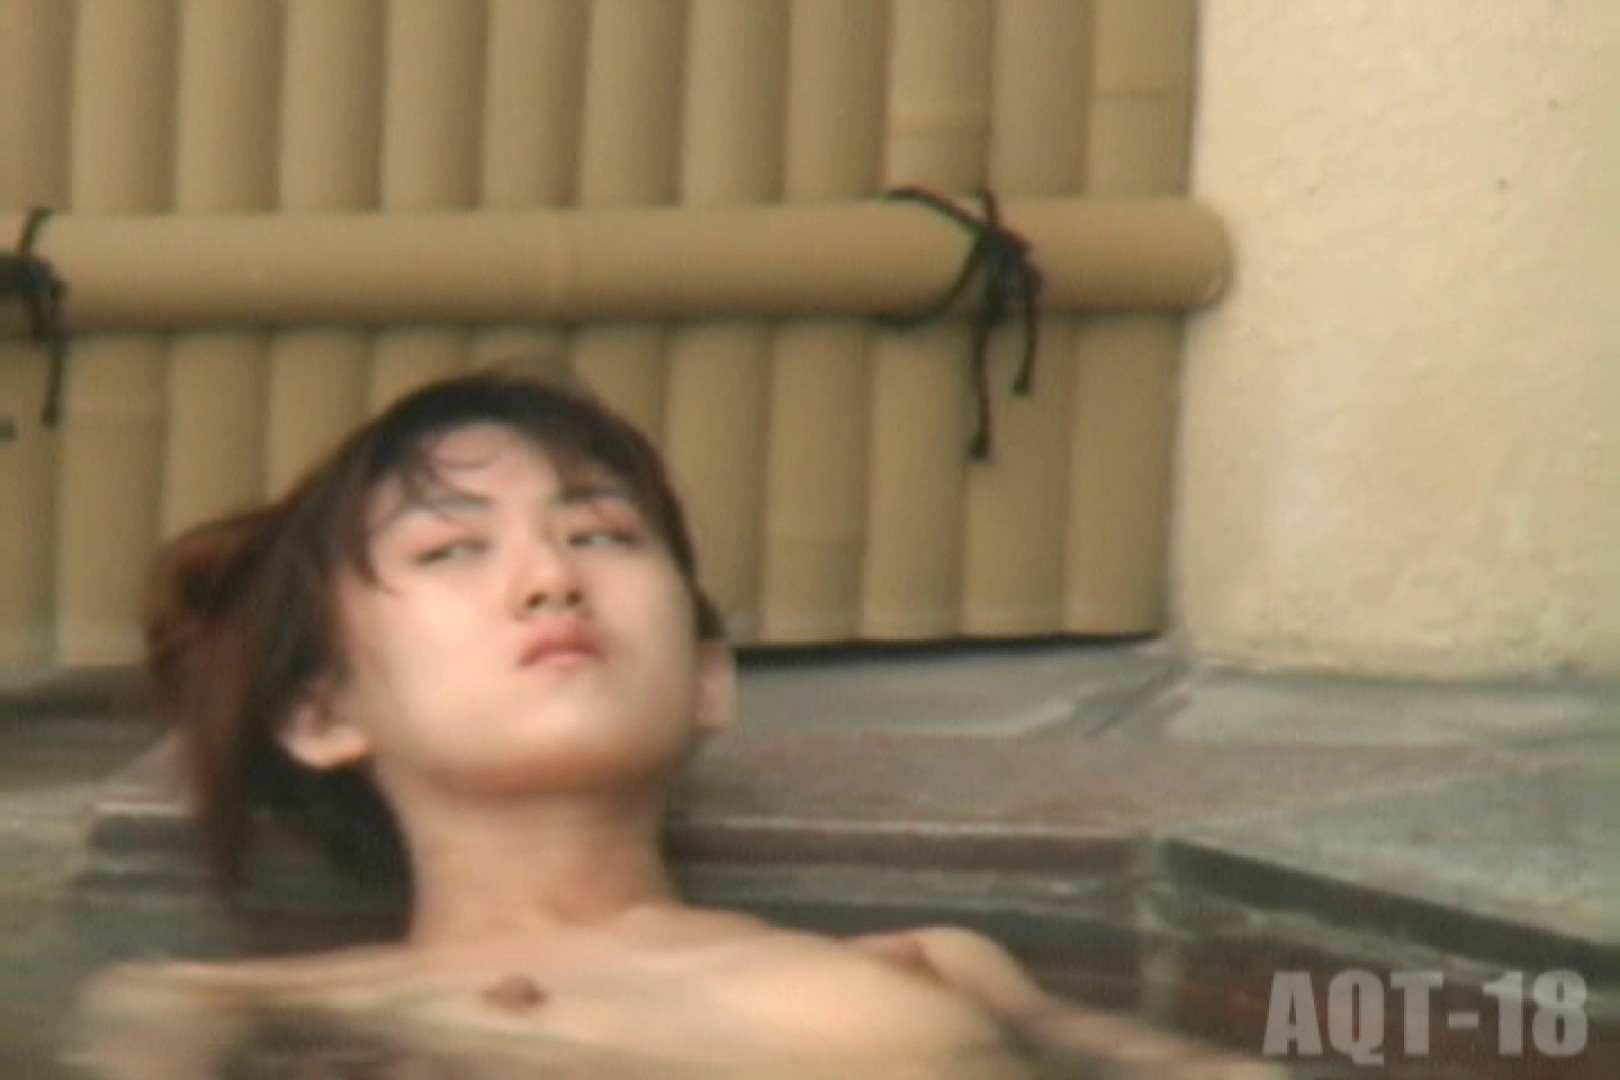 Aquaな露天風呂Vol.862 盗撮 AV無料動画キャプチャ 92PICs 5